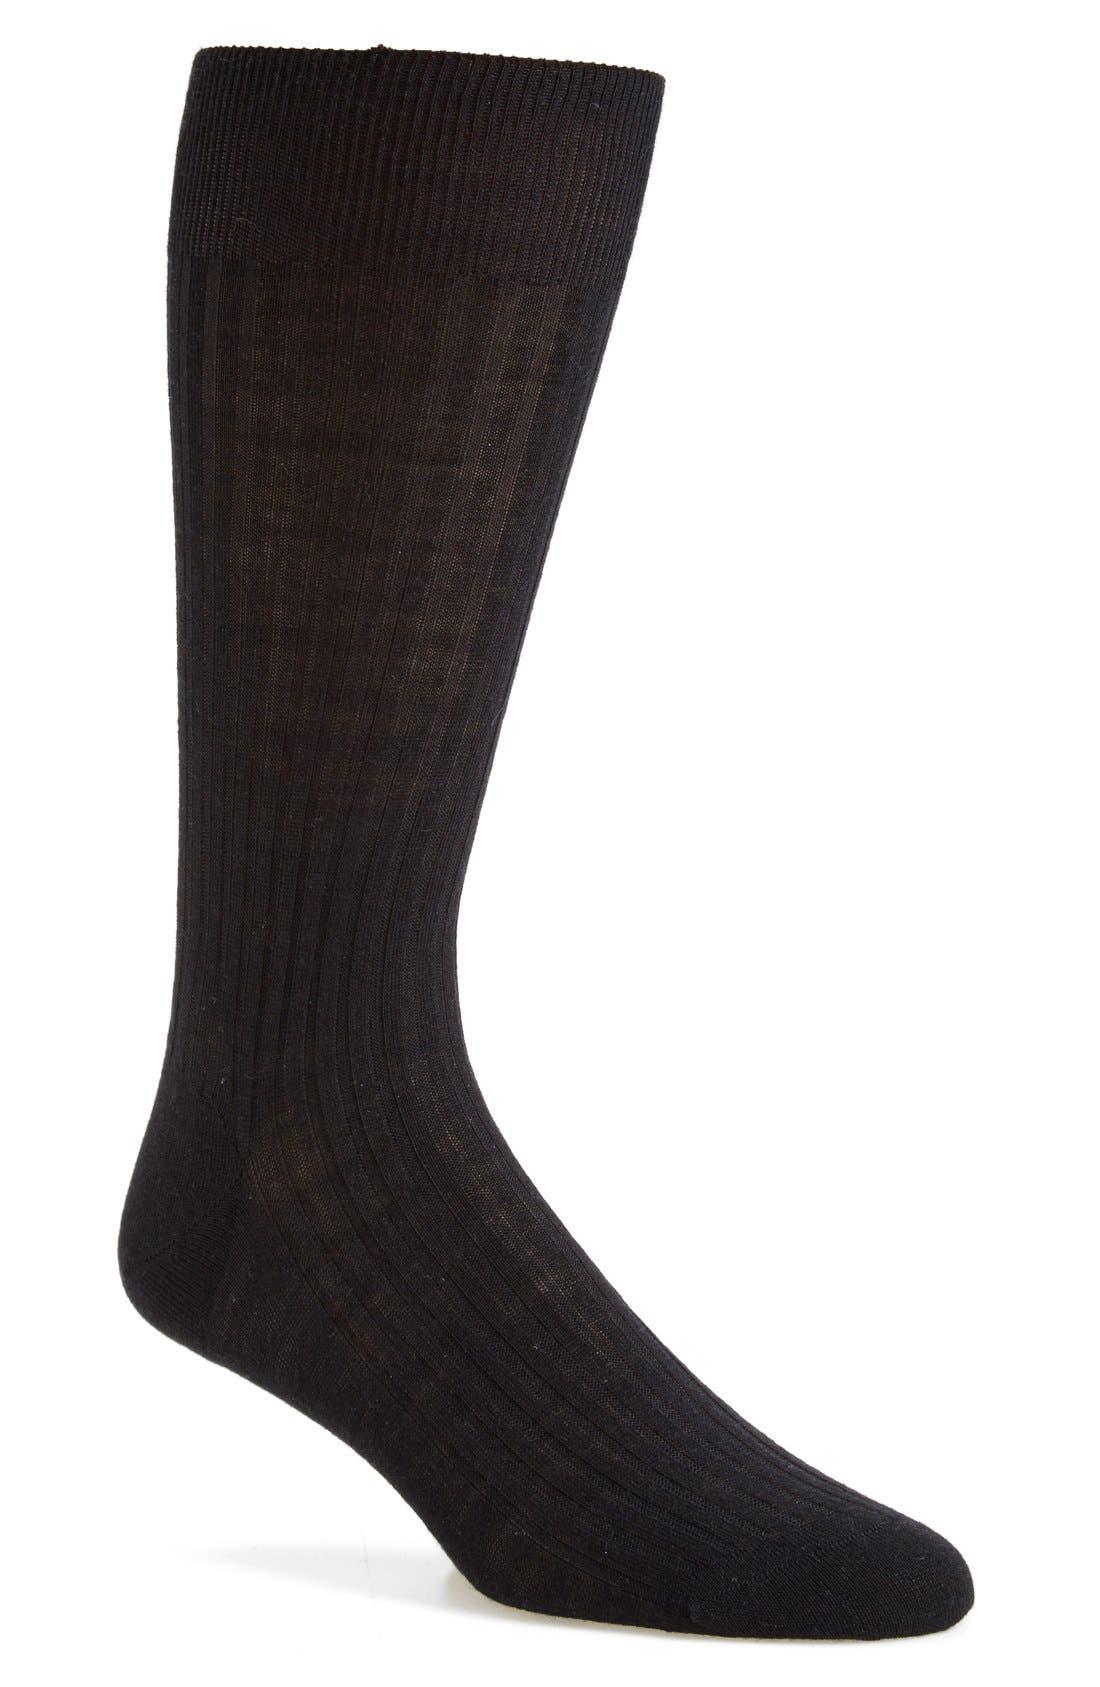 Merino Wool Blend Socks,                         Main,                         color, Black